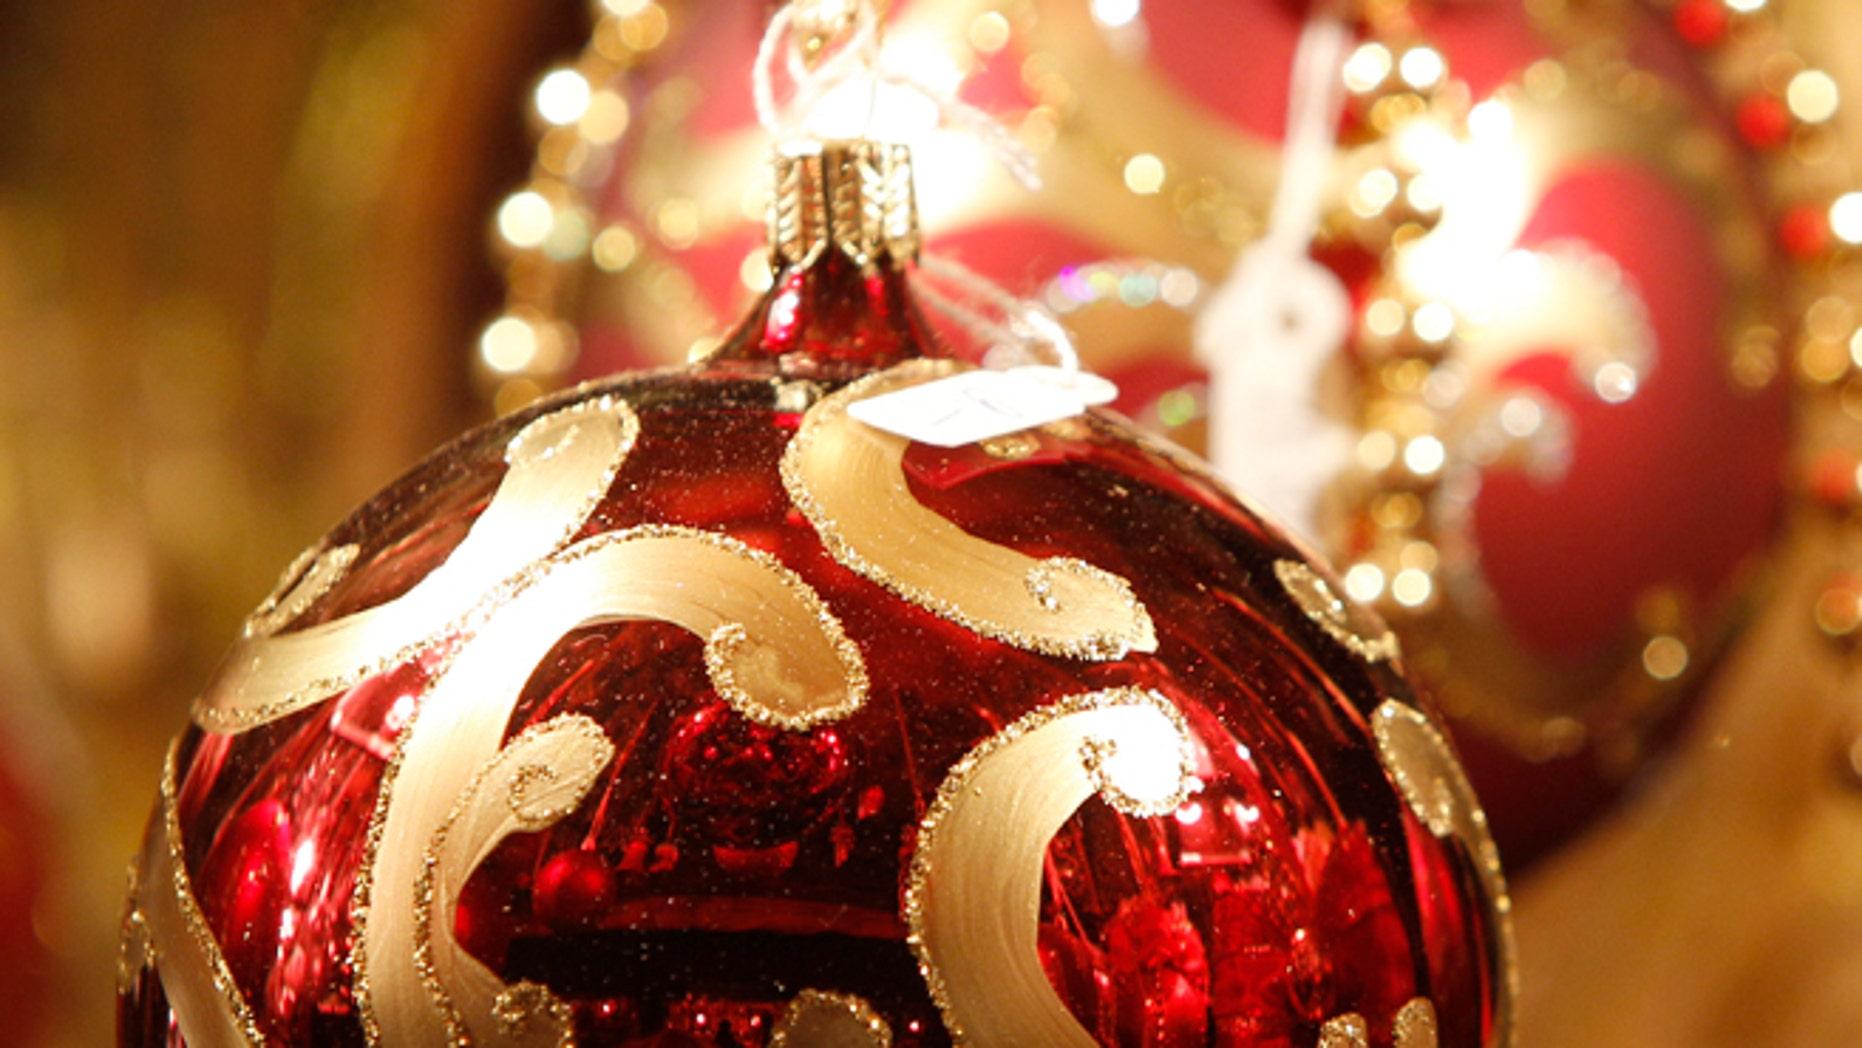 Religious Christmas Music.New Jersey School Bans Religious Christmas Music Fox News